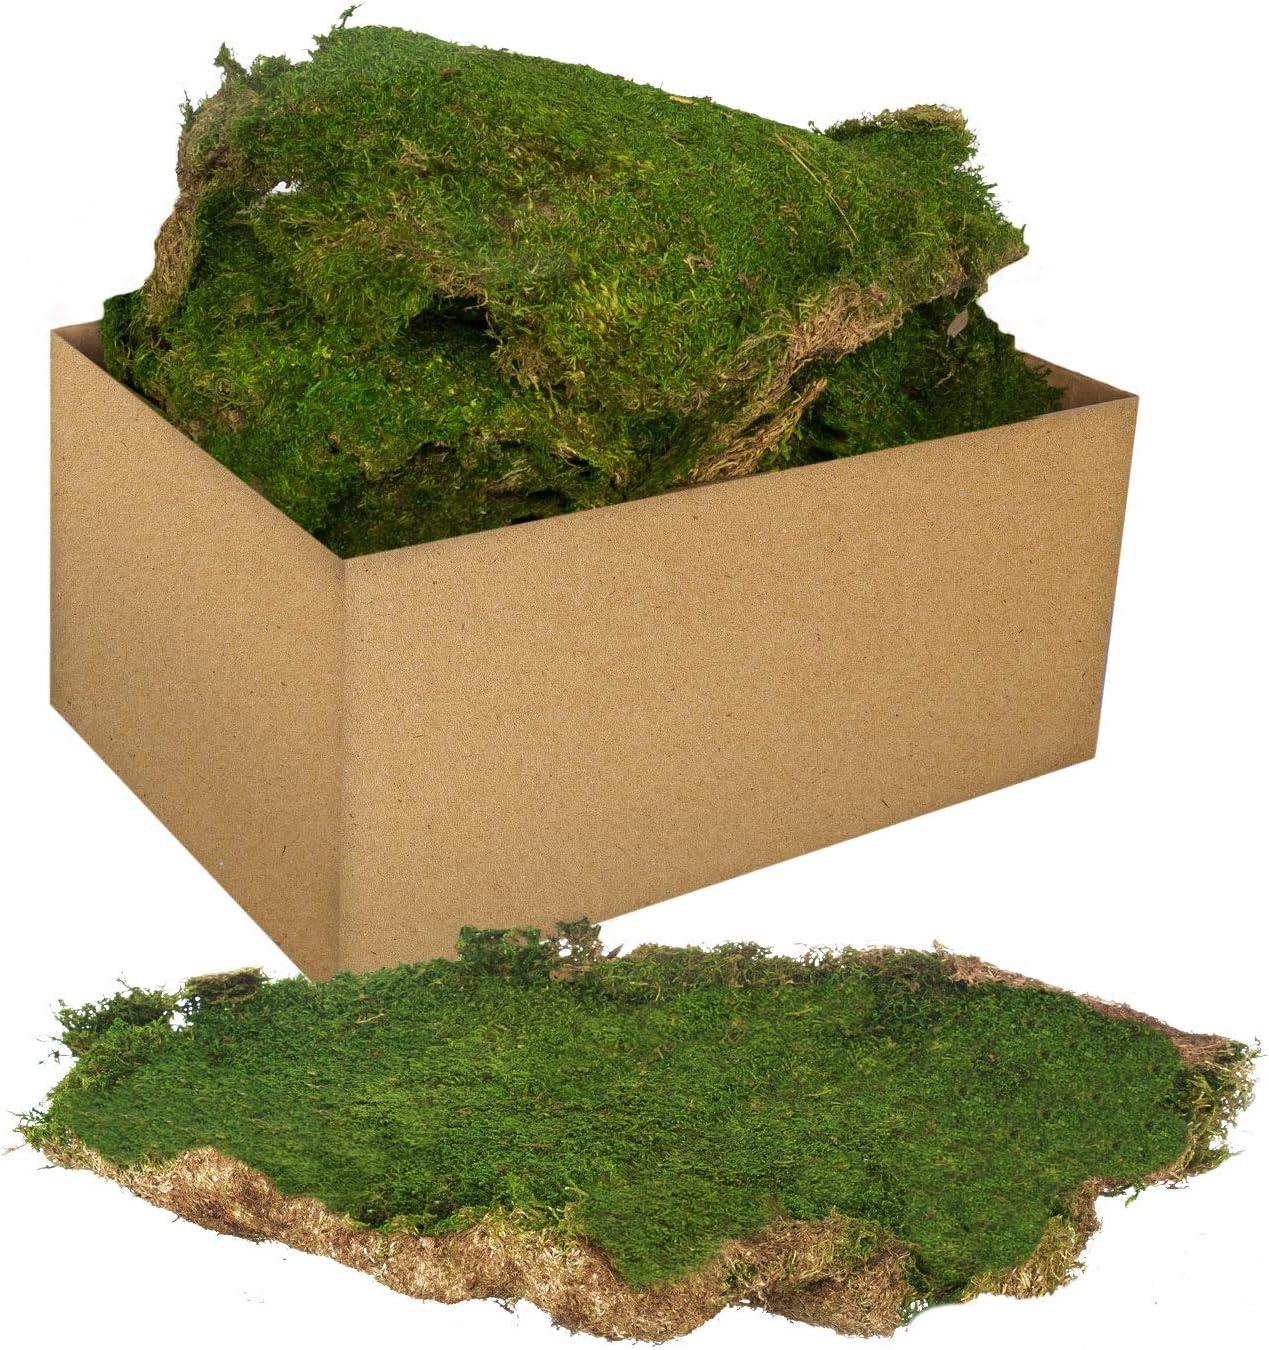 Royal Imports Fresh Dried Forest Green Moss Garden Enhancer Crafts Naturally Preserved 3 LB Bulk Case Loose Chunks for Decoration Flower Arrangements